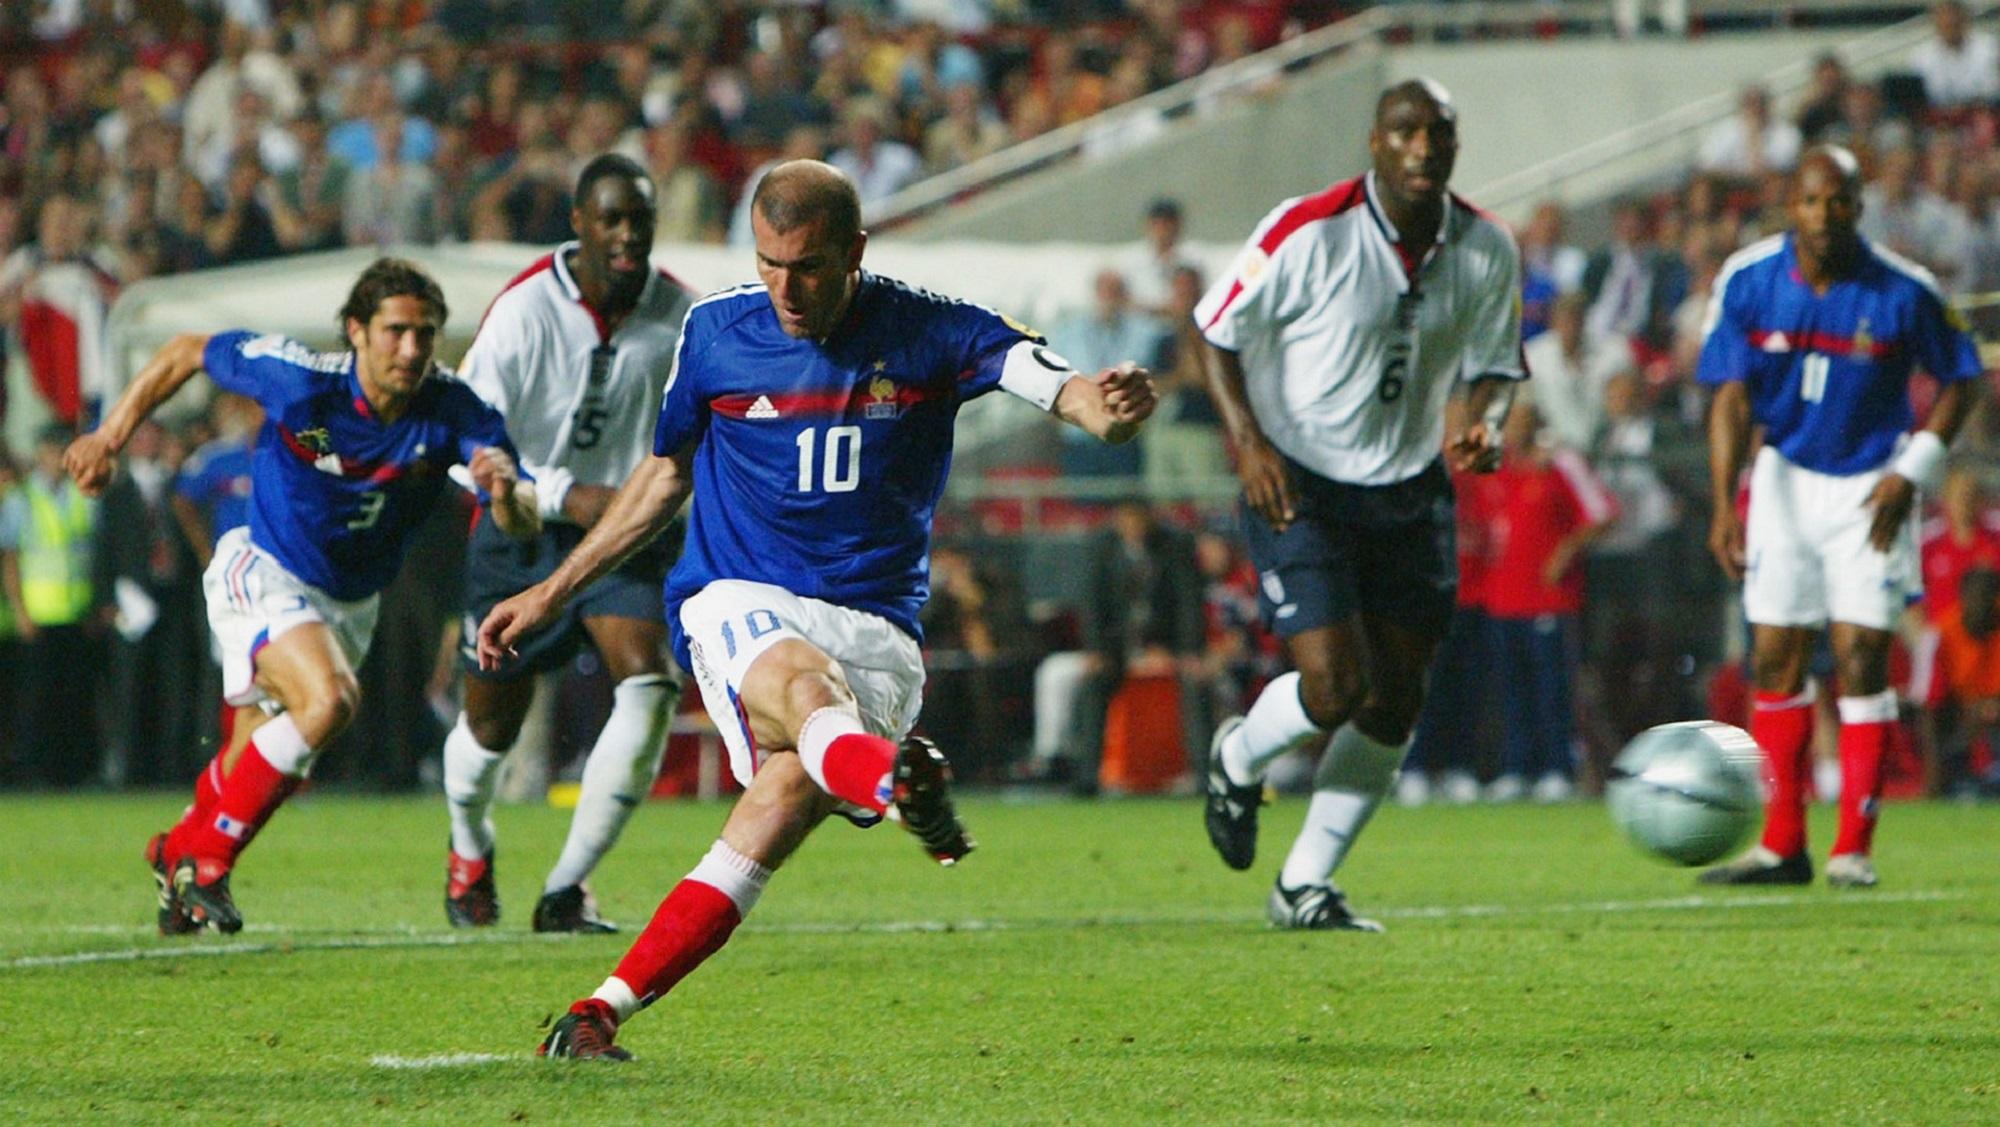 hd-zidane-france-england-2004_hvybhycbtx2i1dw3qtr6vpd6f